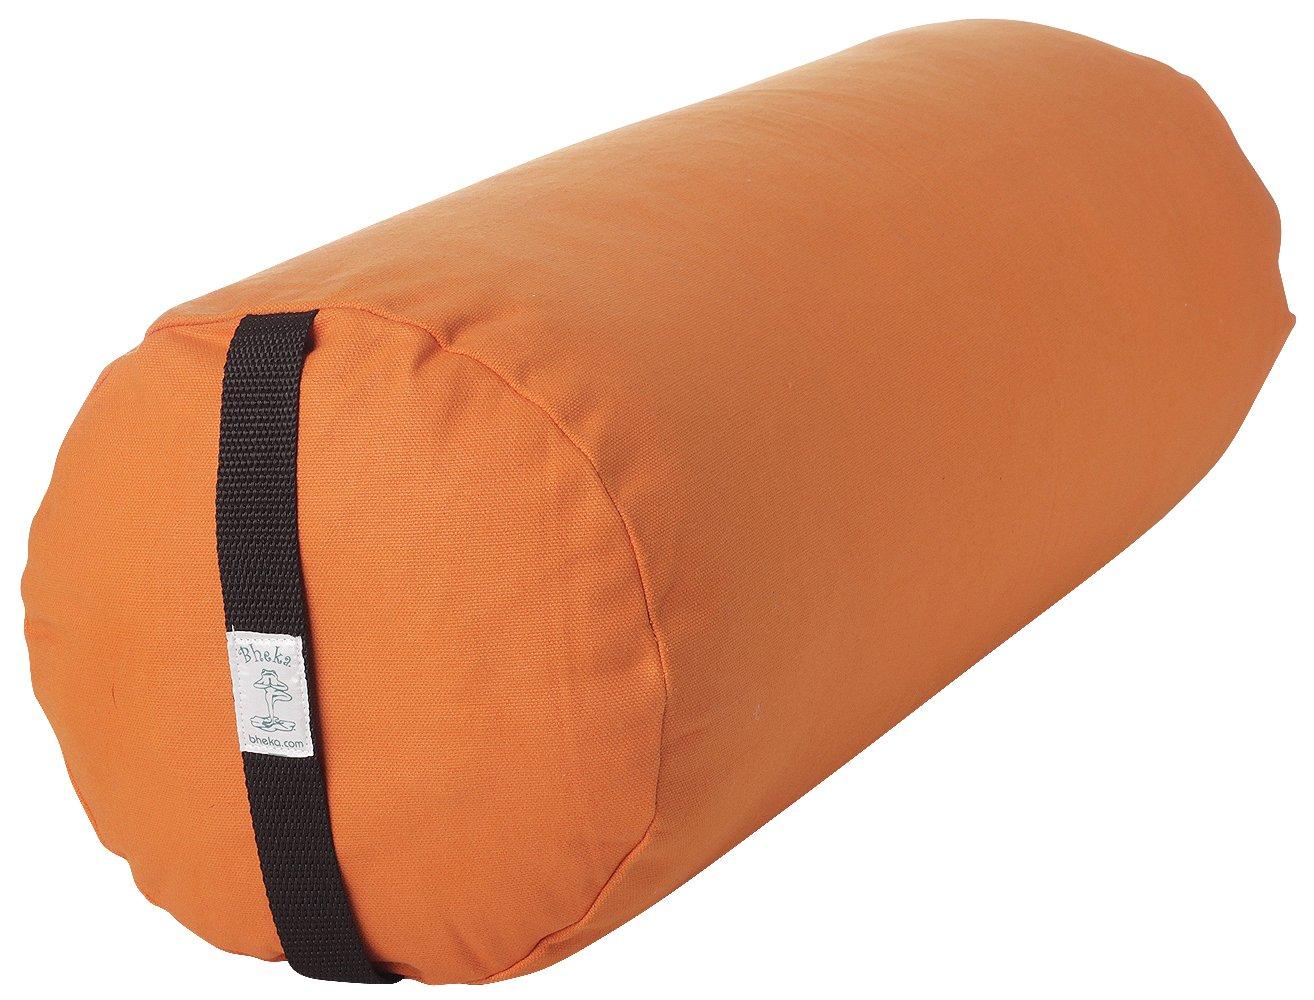 Bhekaラウンド100 %コットンヨガBolster (オレンジ)   B002DPQLGM